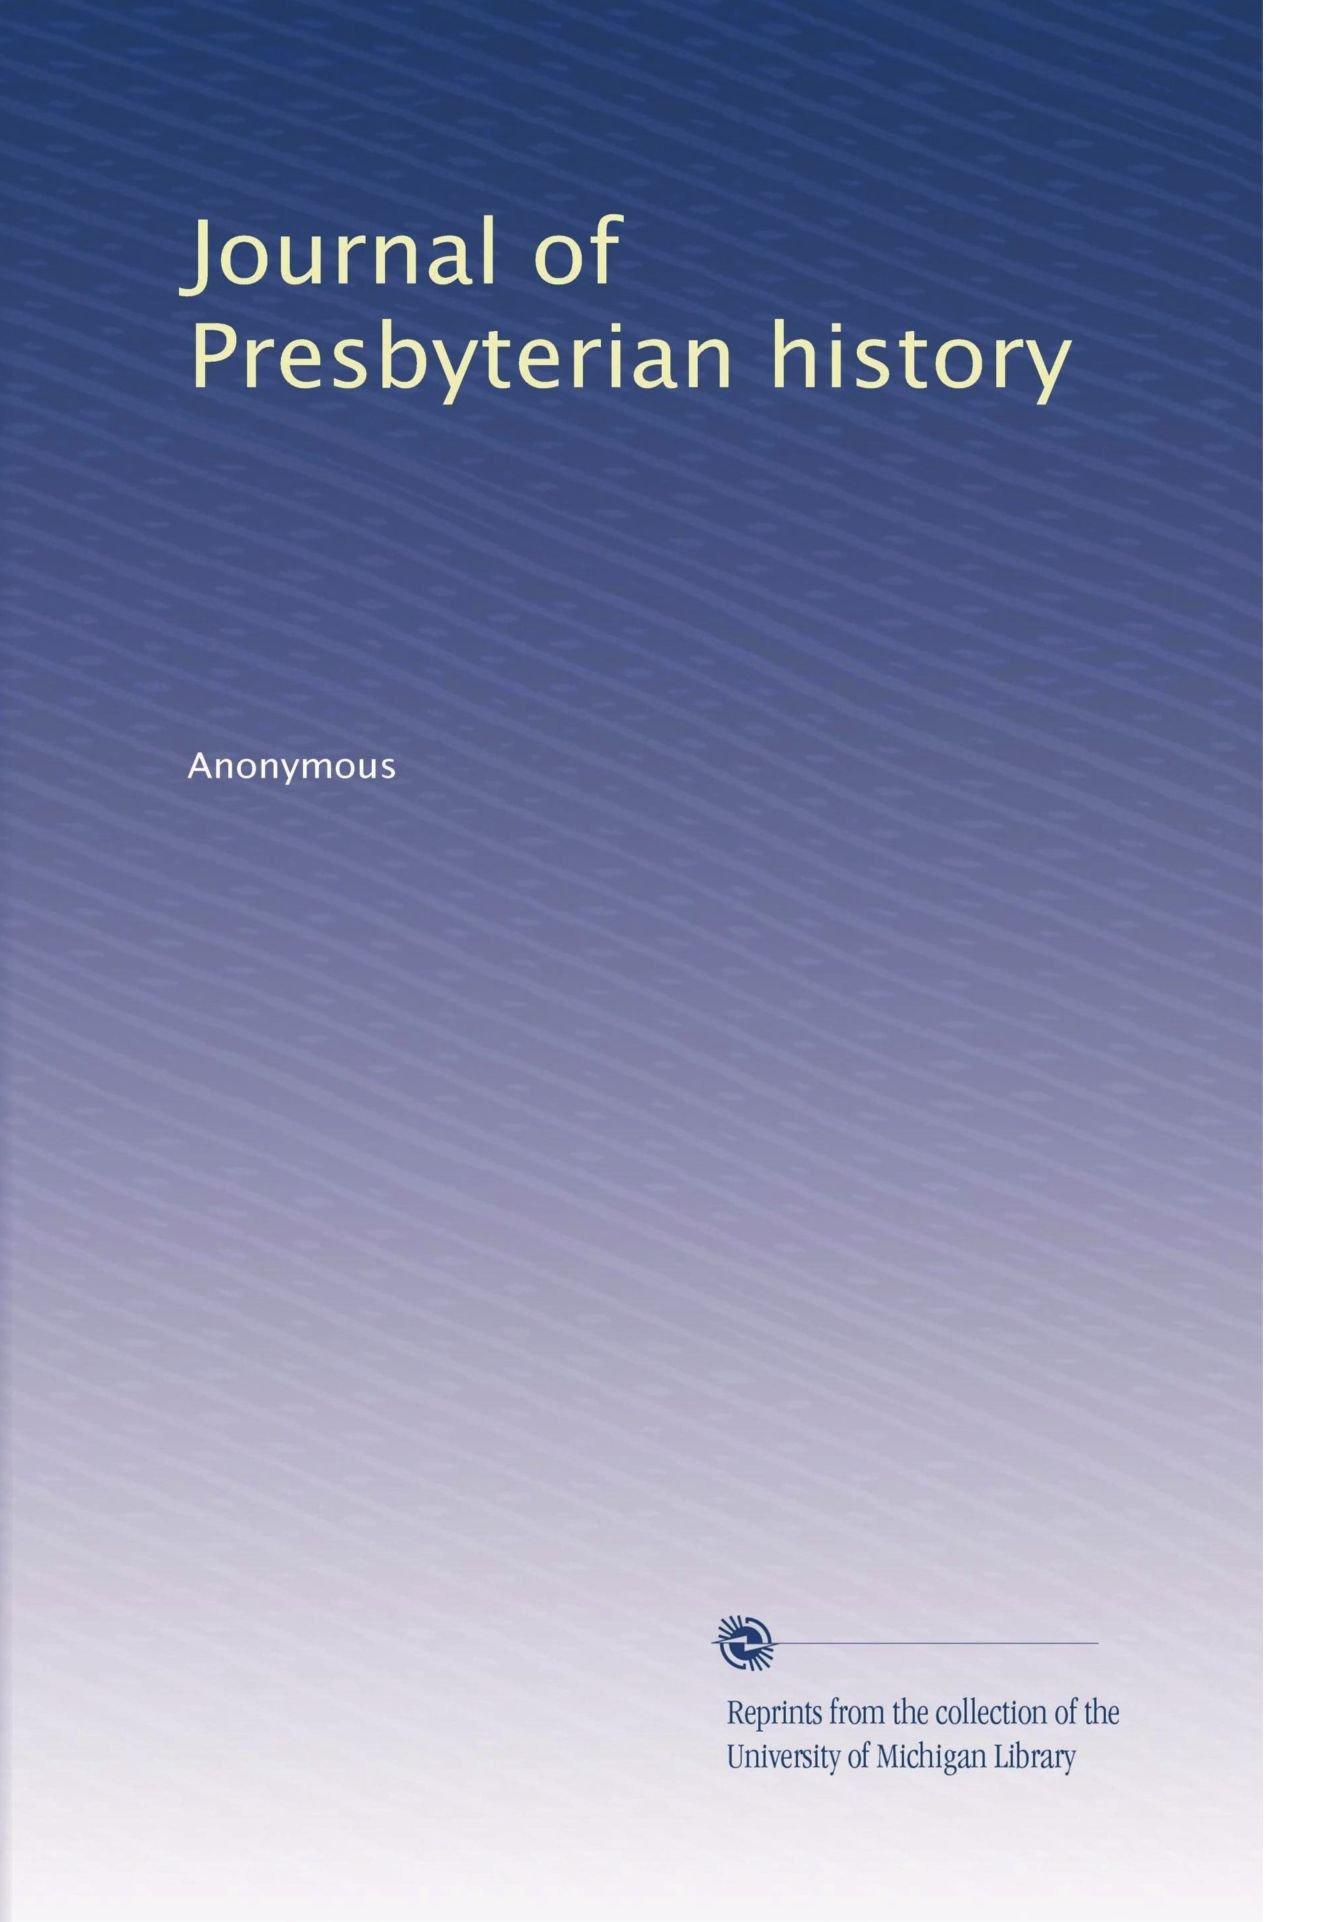 Journal of Presbyterian history (Volume 5) PDF